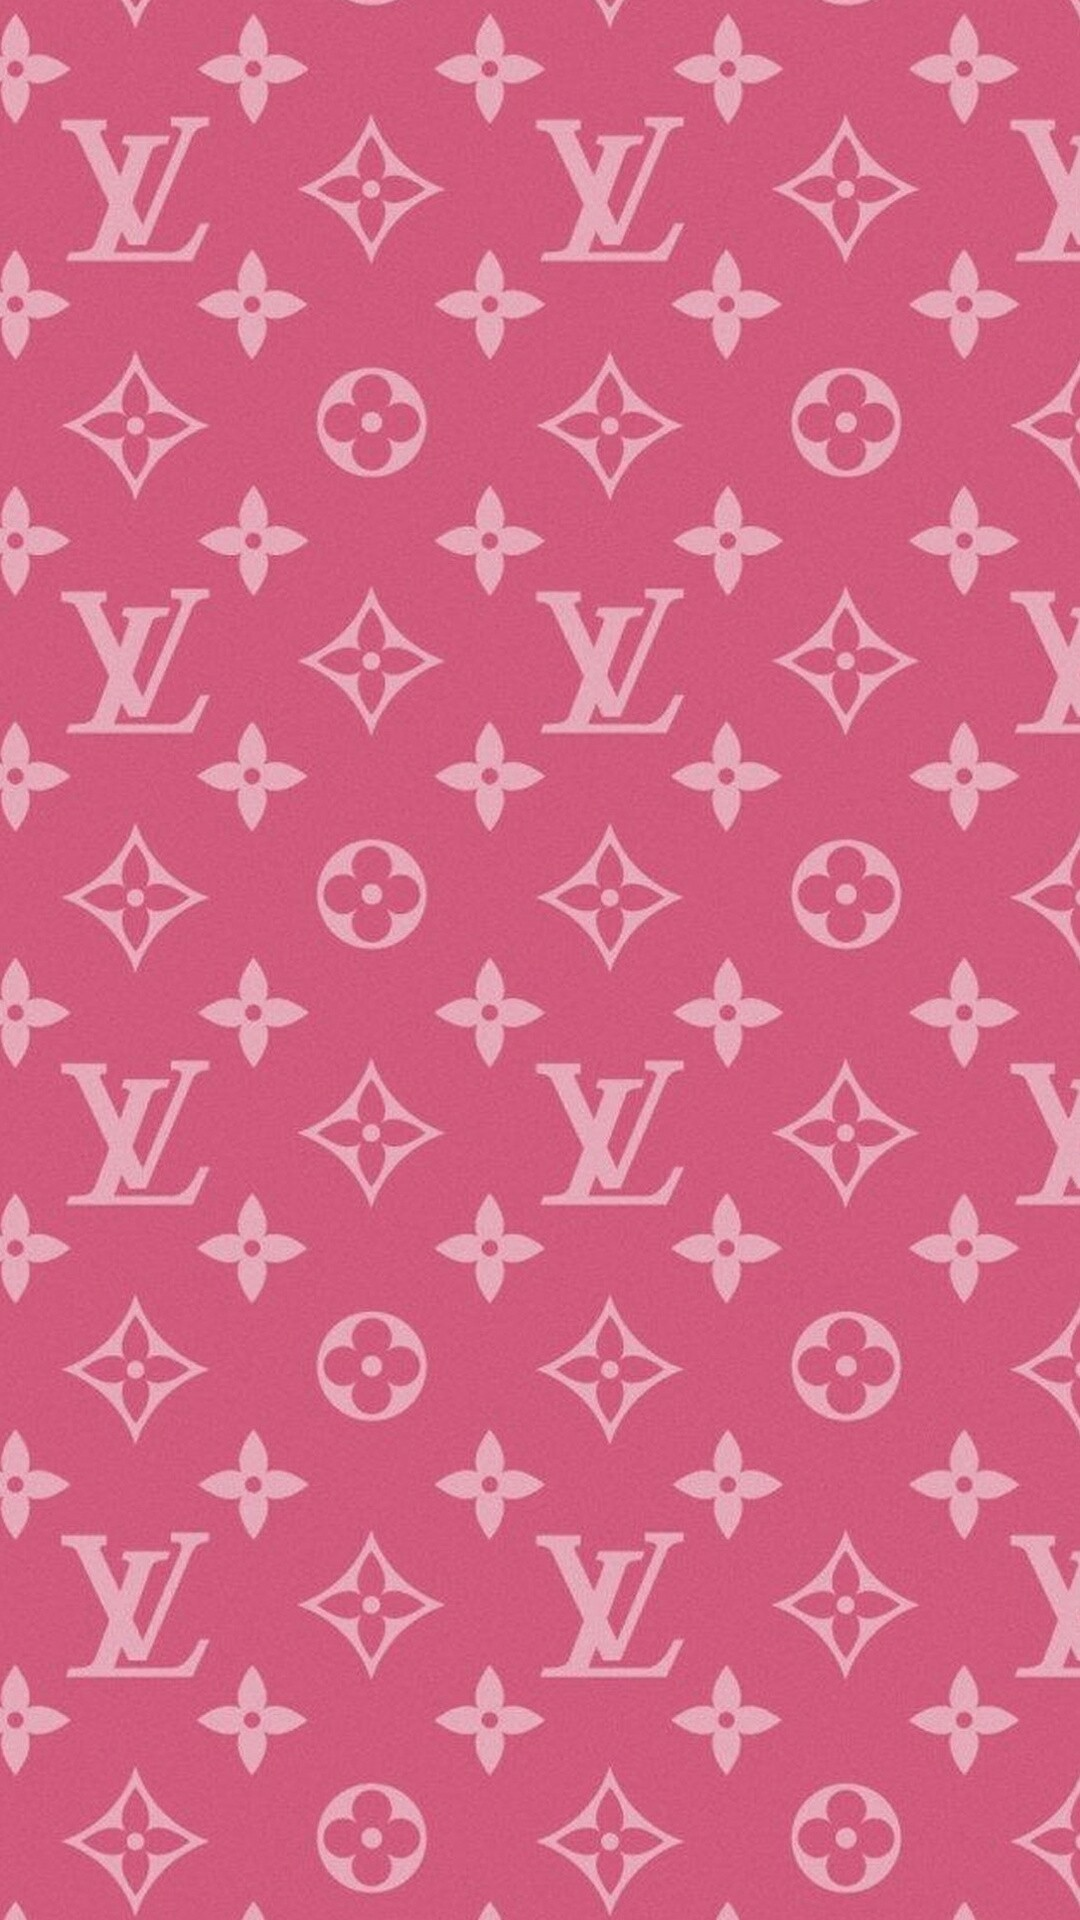 Louis Vuitton Background Wallpapertag